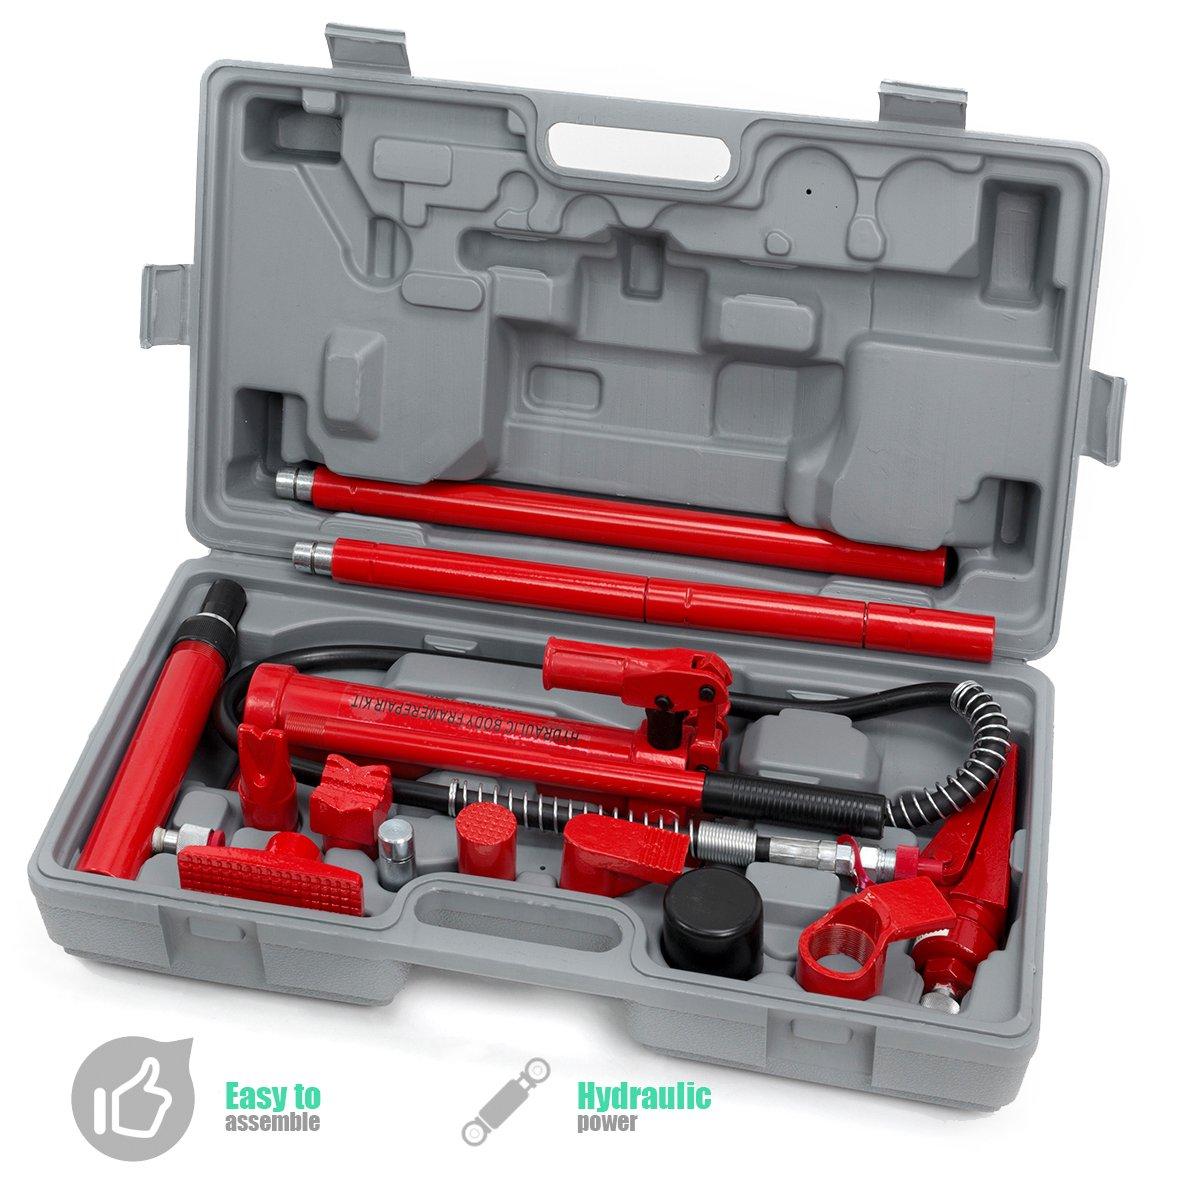 G body frame repair kit - G Body Frame Repair Kit 27